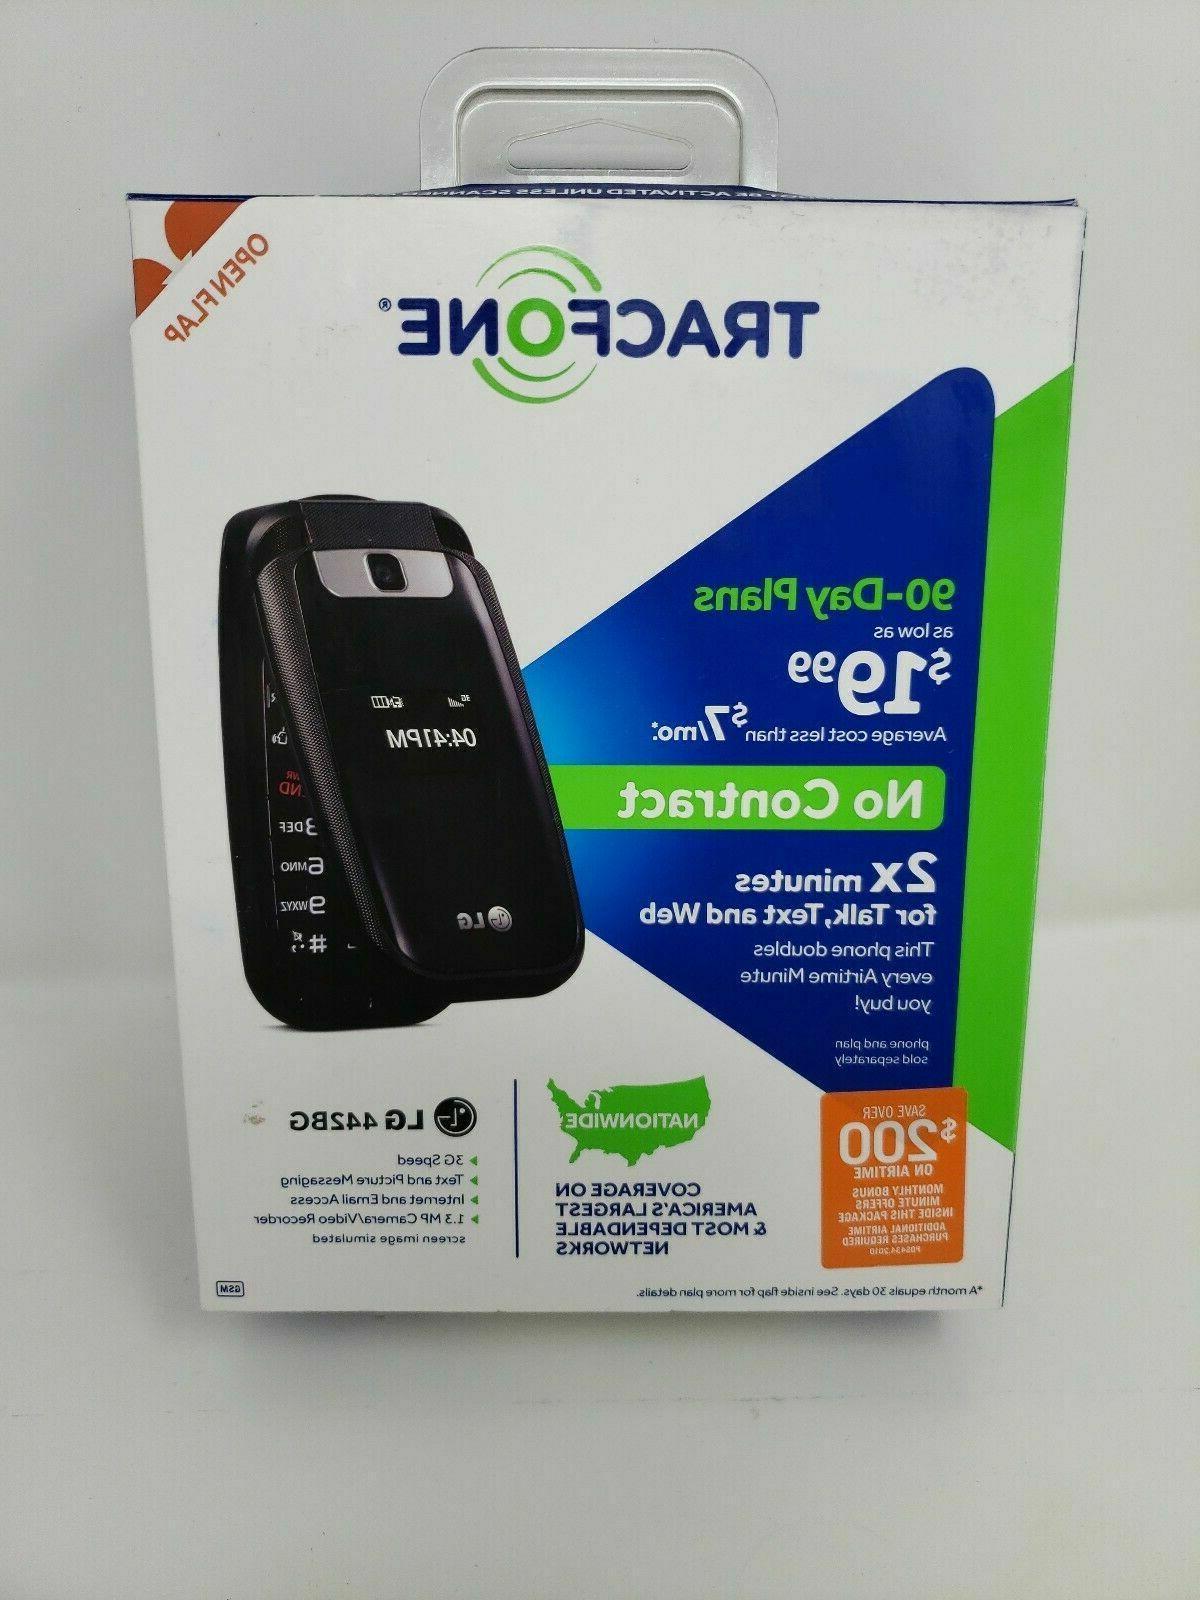 TracFone LG L441G Prepaid Phone - Packaging